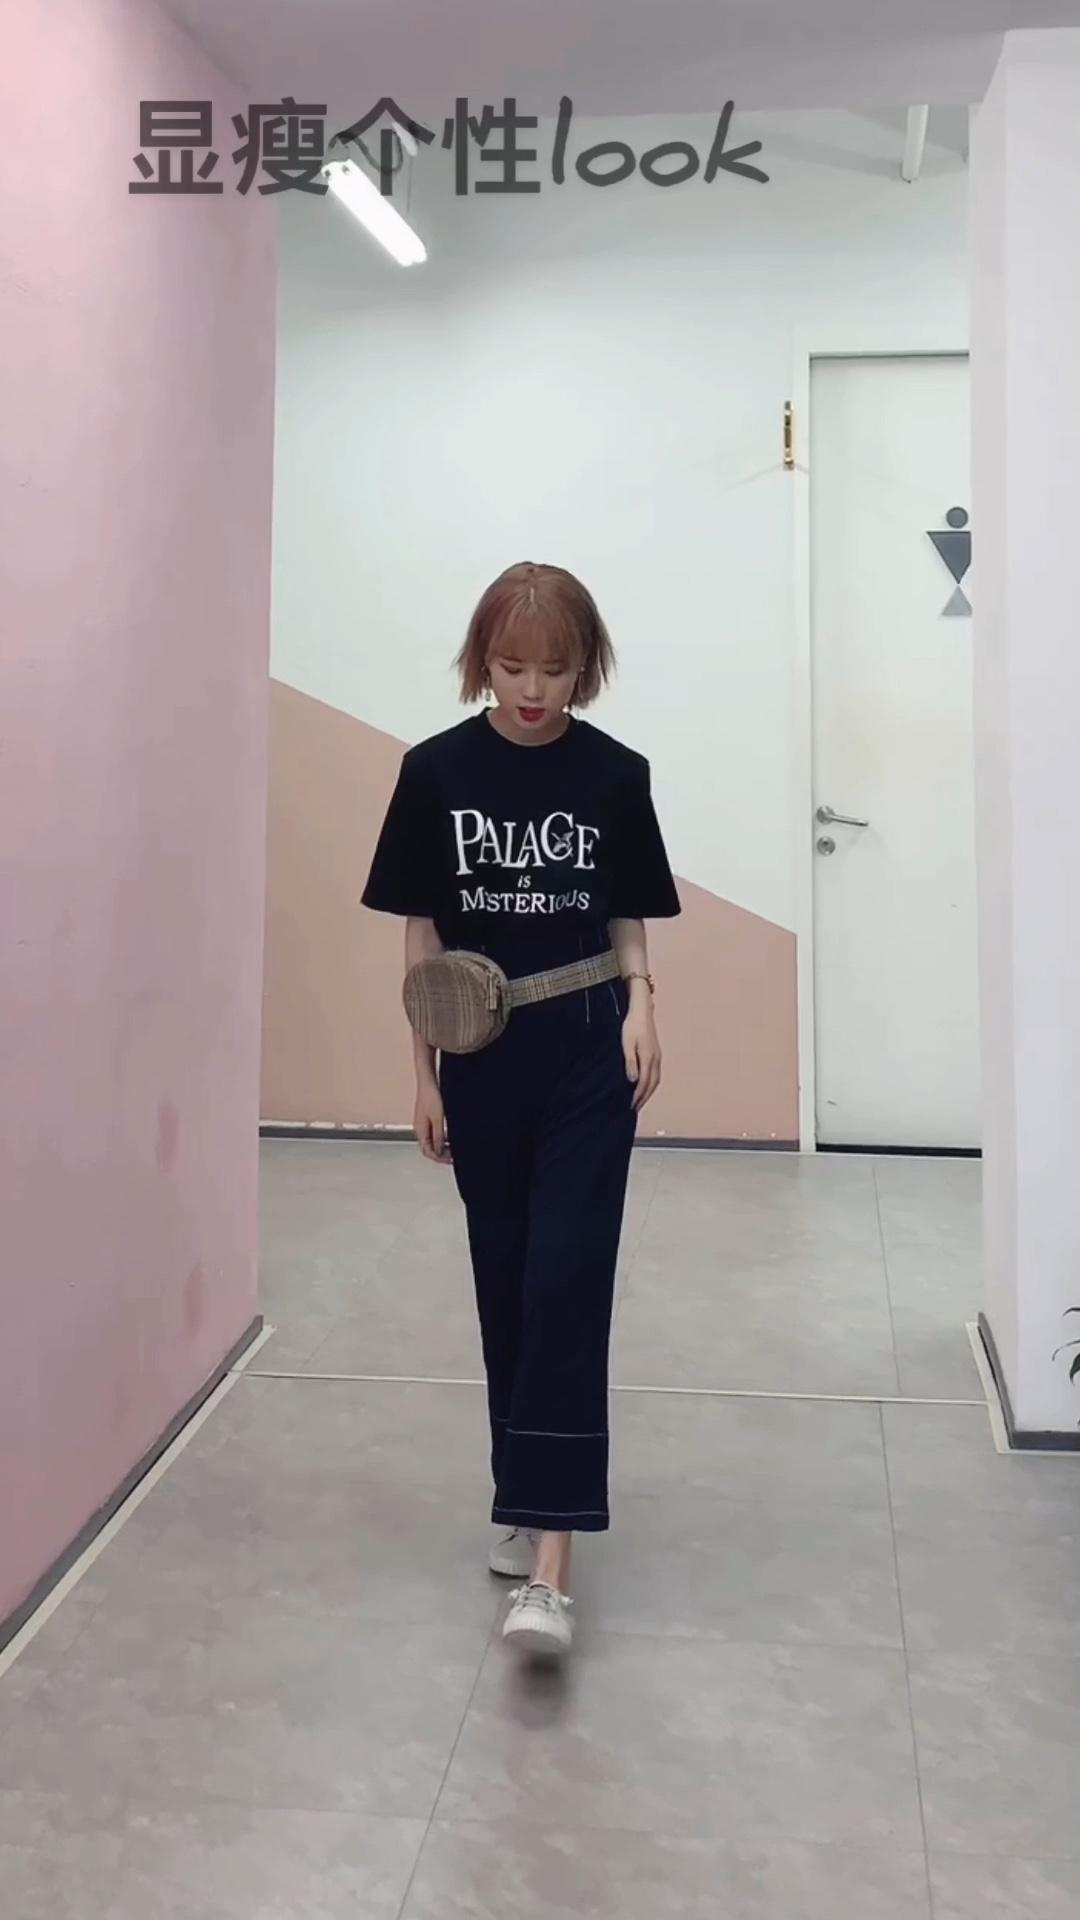 —look—  这件T恤我超爱的 经典的黑白字母T 搭配了深蓝色的阔腿裤 微胖女孩这样穿还能遮肉显瘦 整体的搭配亮点在于腰包 让整身look具有个性~ #蘑菇街新品测评#